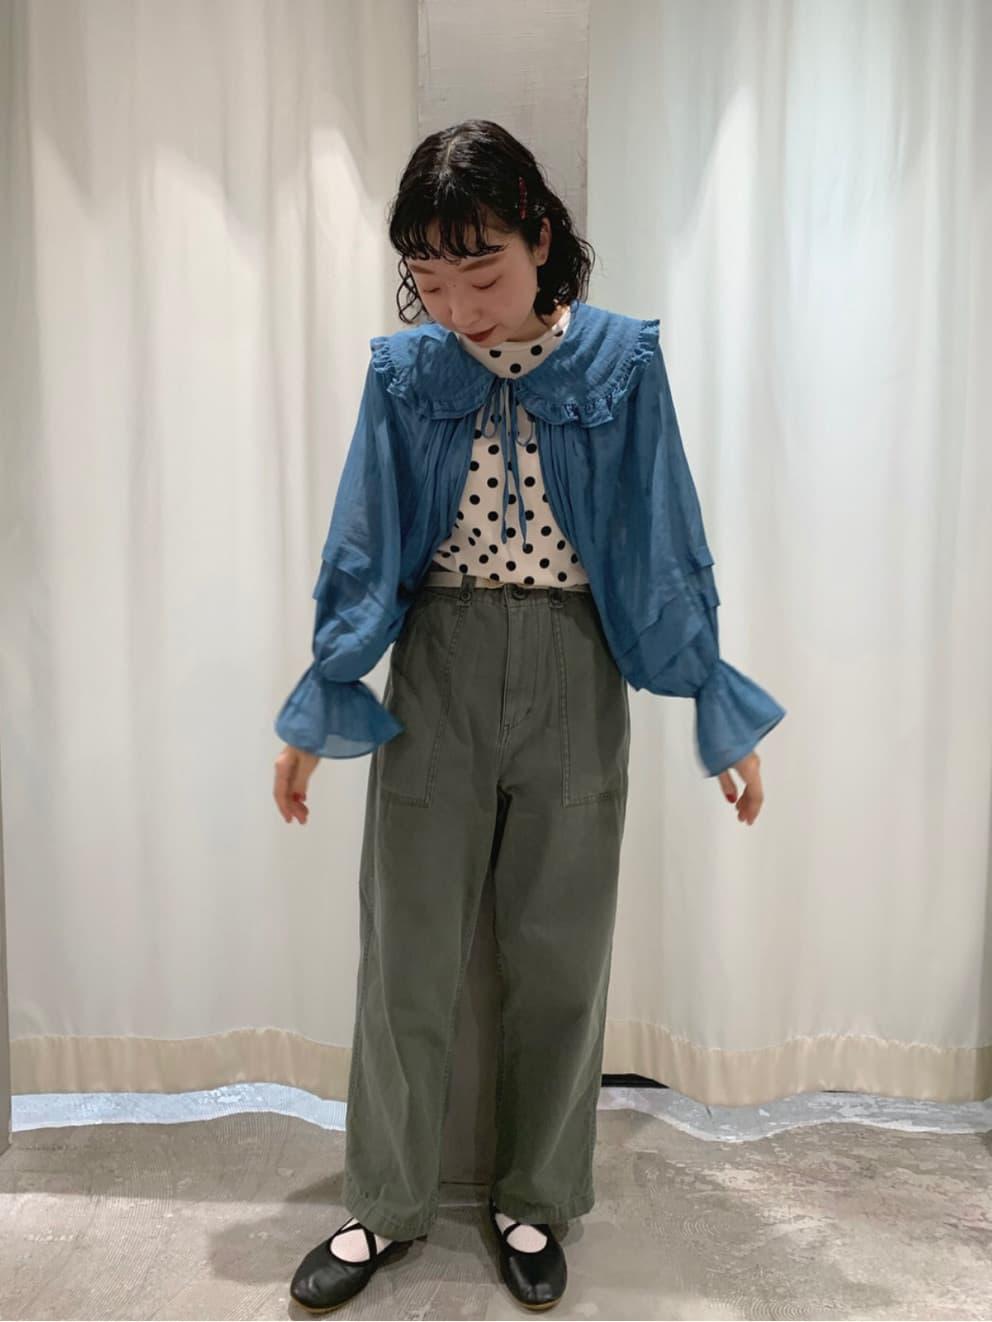 - CHILD WOMAN CHILD WOMAN , PAR ICI ルミネ横浜 身長:157cm 2021.08.17